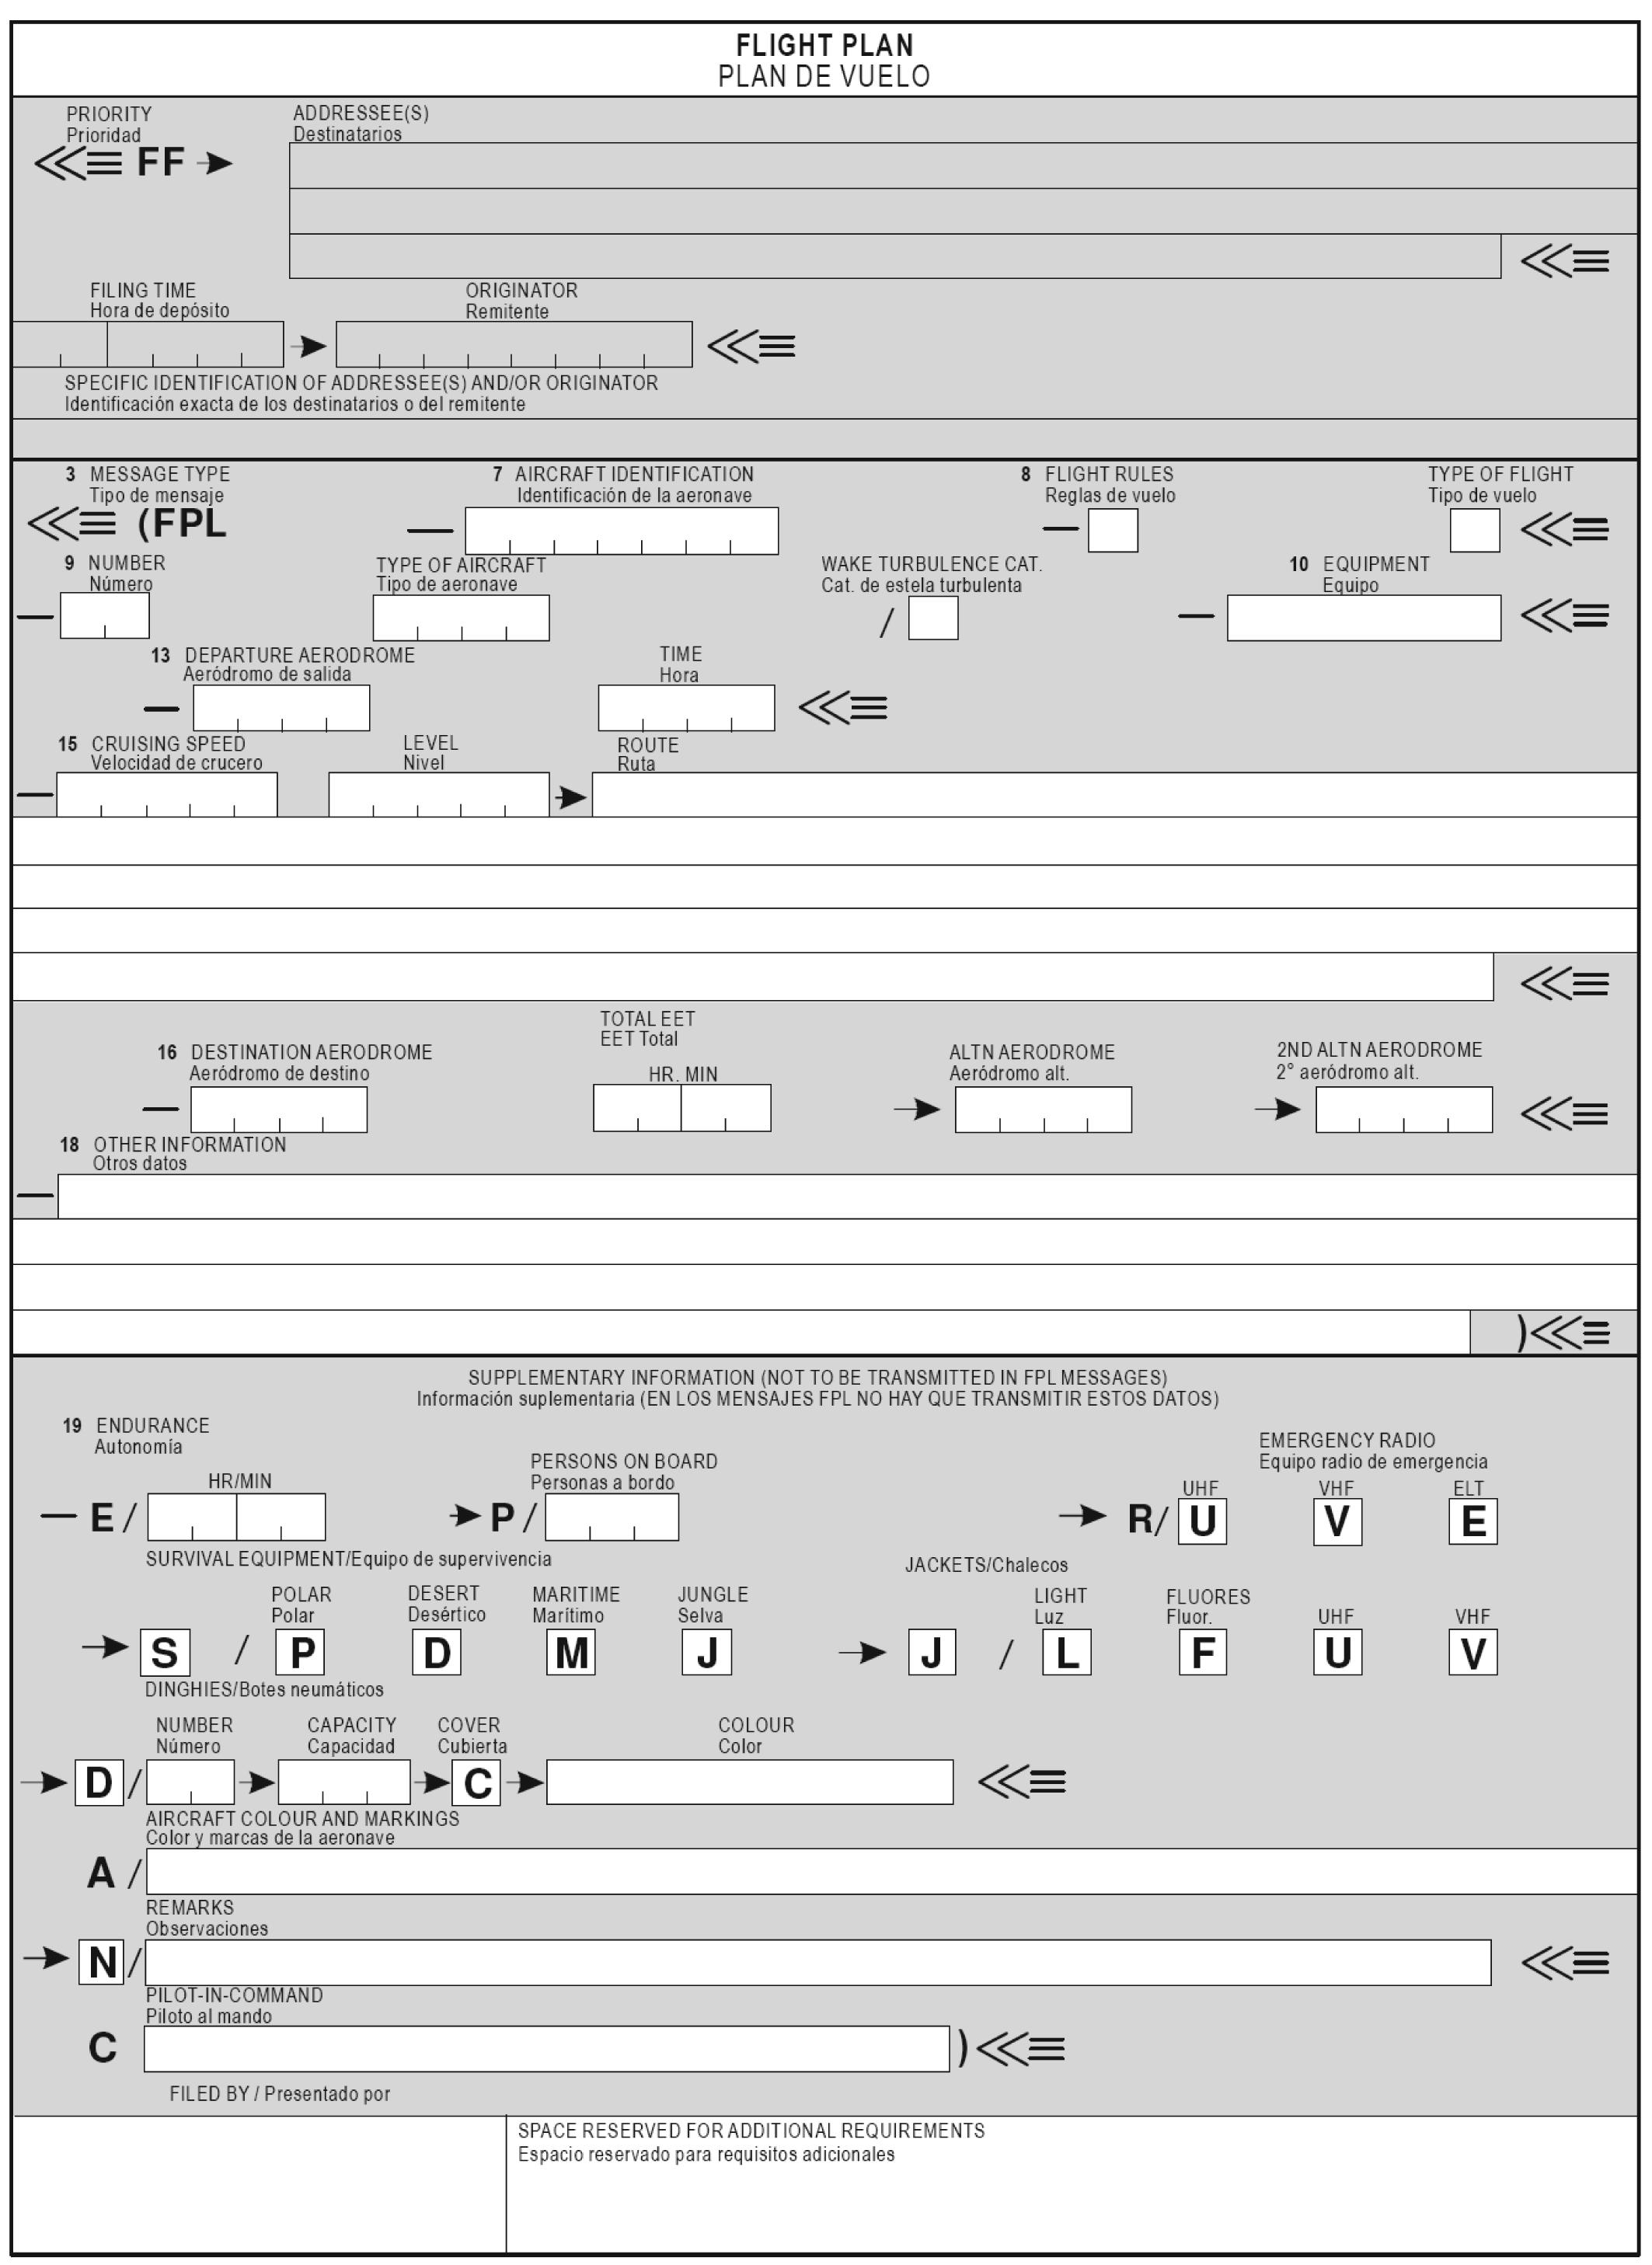 BOE.es - Documento BOE-A-2014-6856